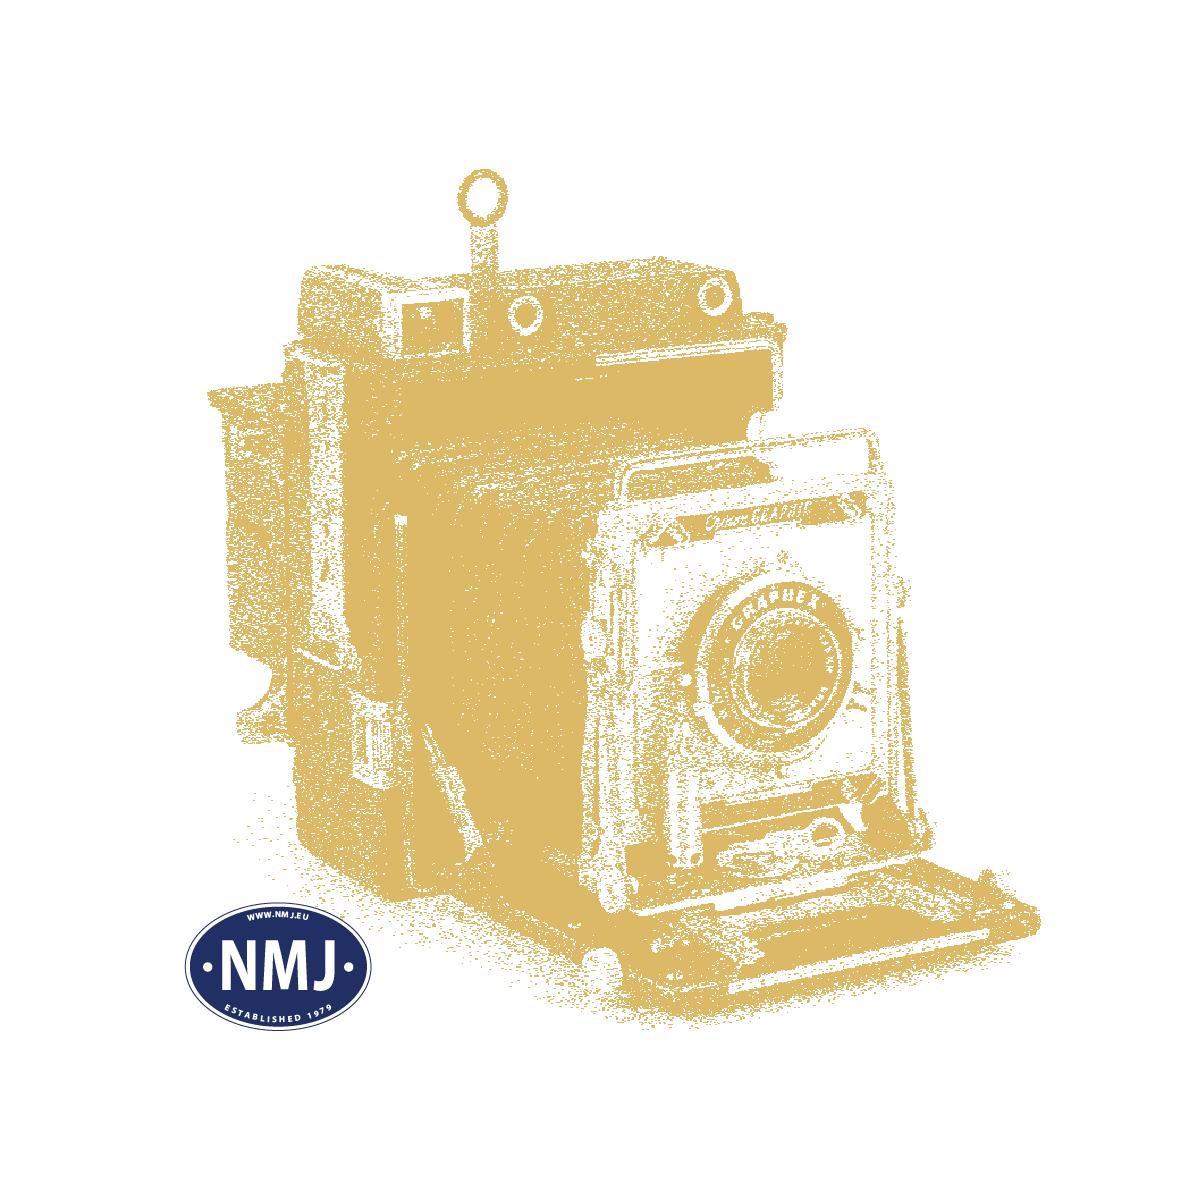 NMJT145005 - NMJ Topline NSB Di3.602, Rot/Schwarz mit GM Logo, DCC m/ Sound, Spür 0